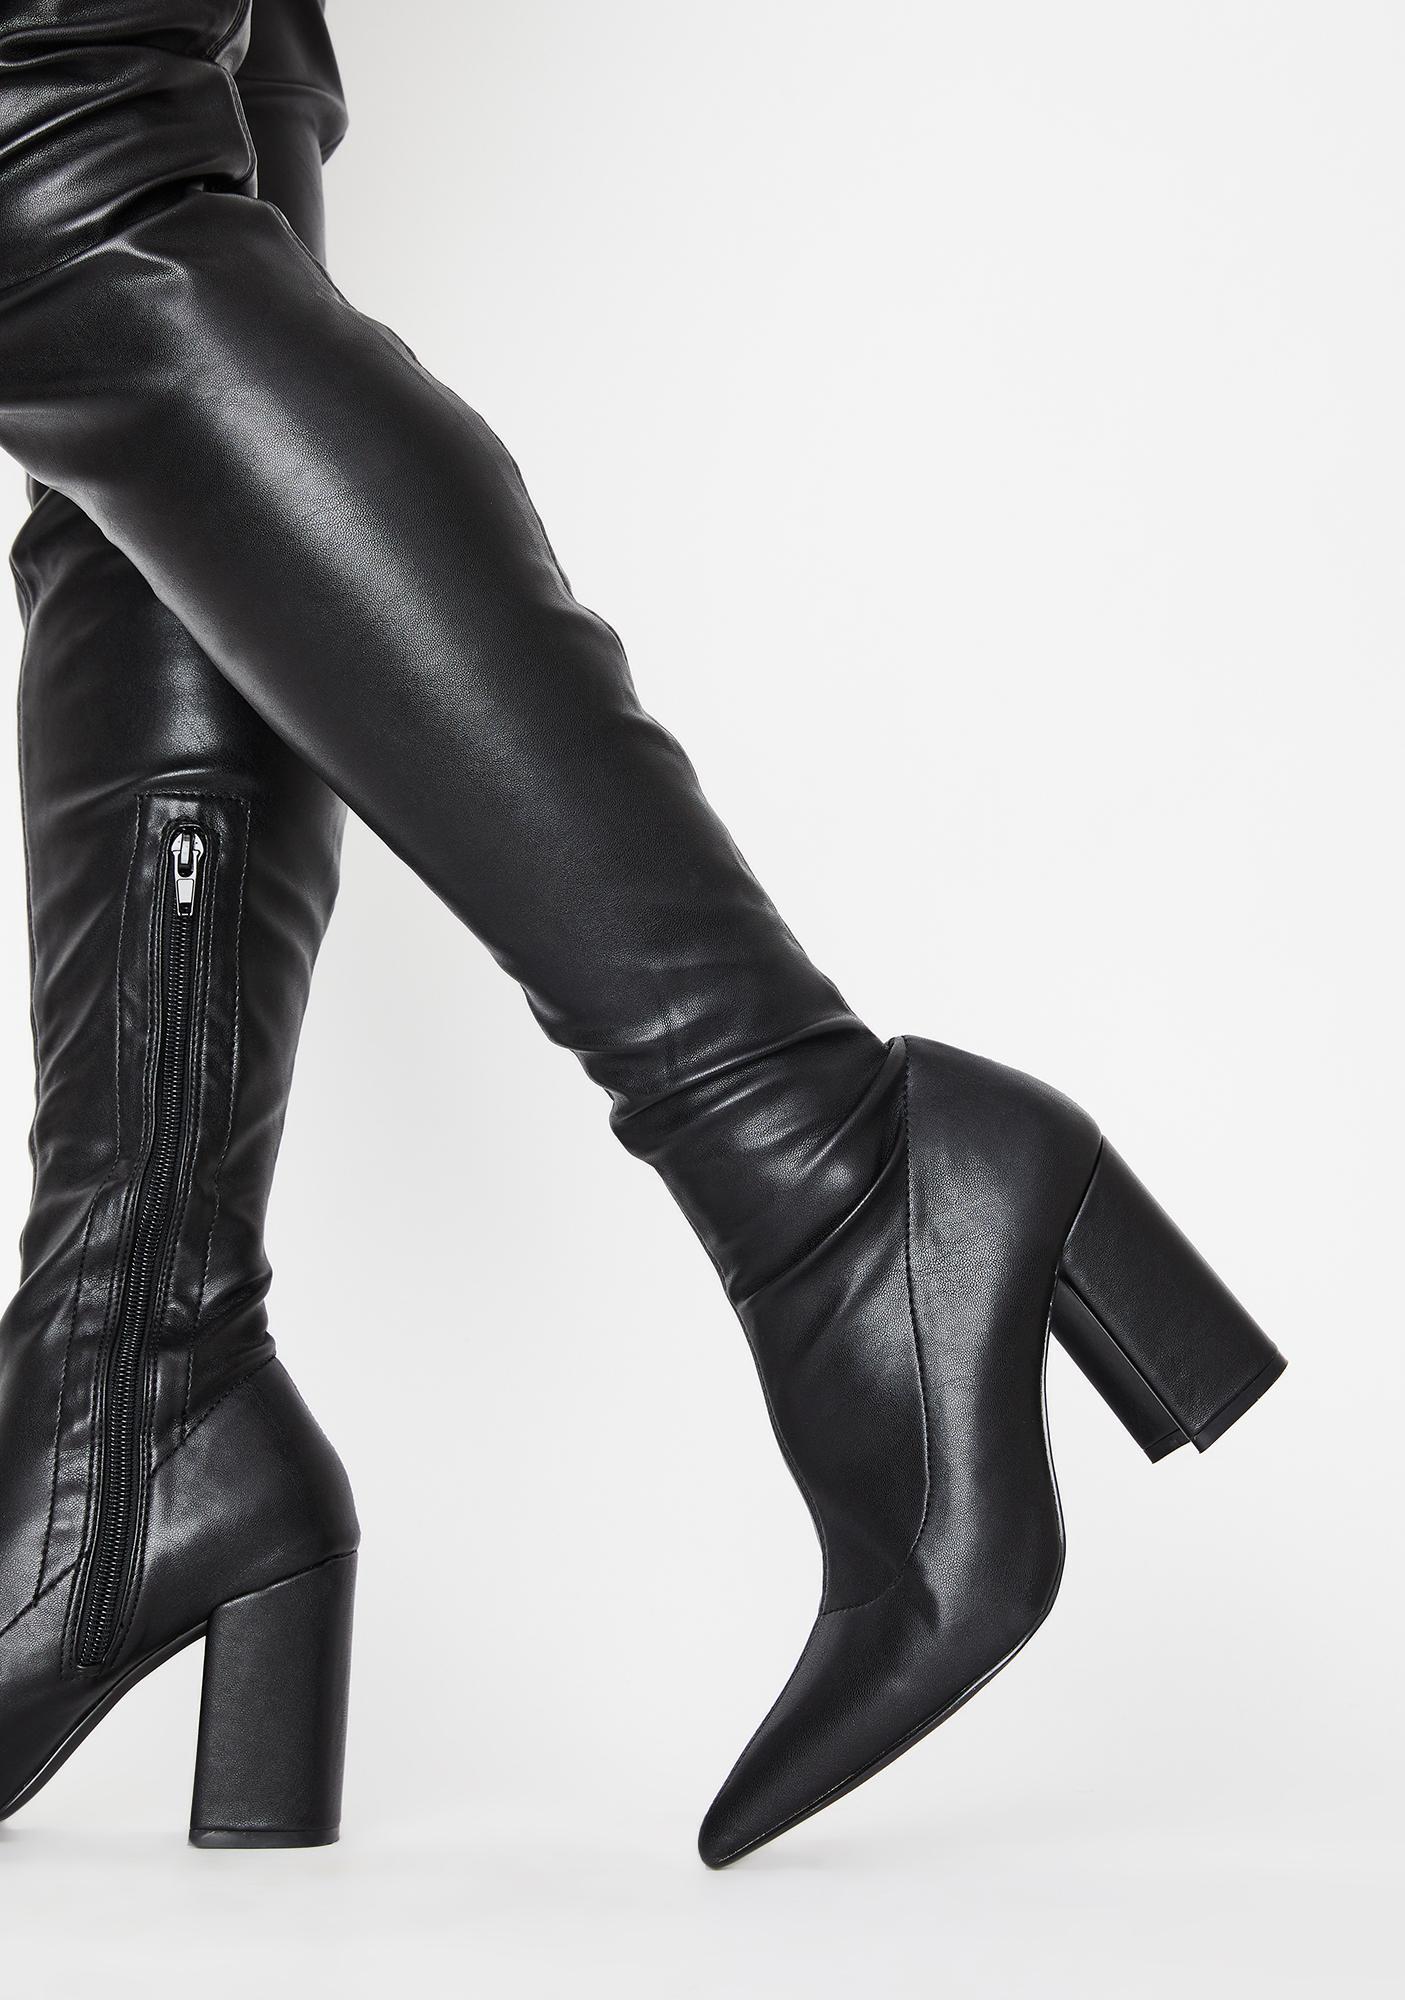 Fantasized Lie Thigh High Boots